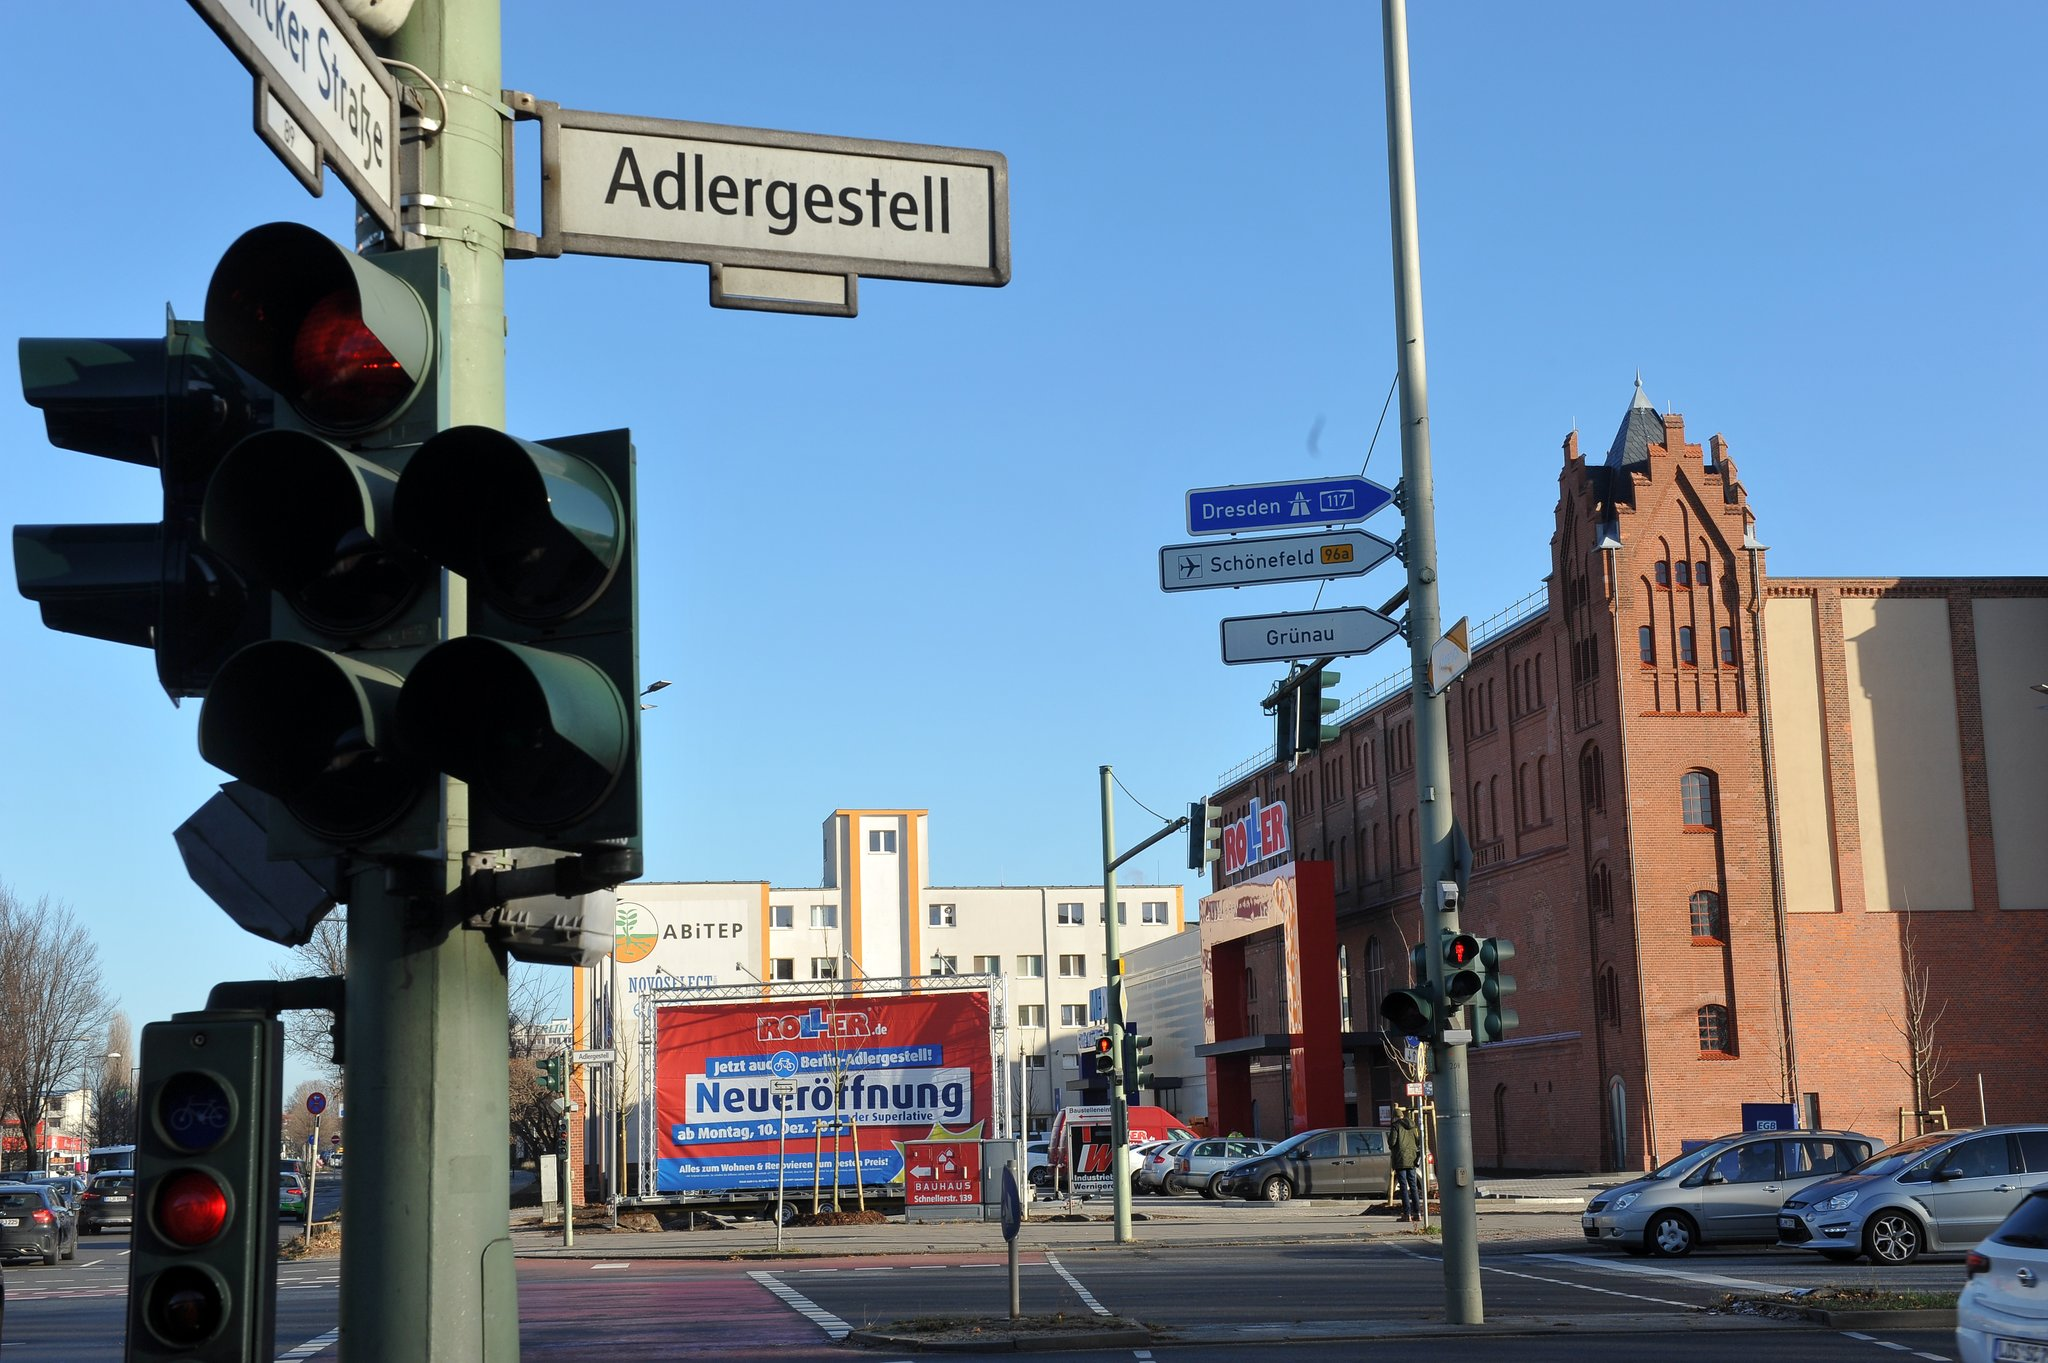 a42b3310dd5e4a Möbel-Discounter jetzt auch in Adlershof  ROLLER eröffnet am 10. Dezember  am Adlergestell - Adlershof